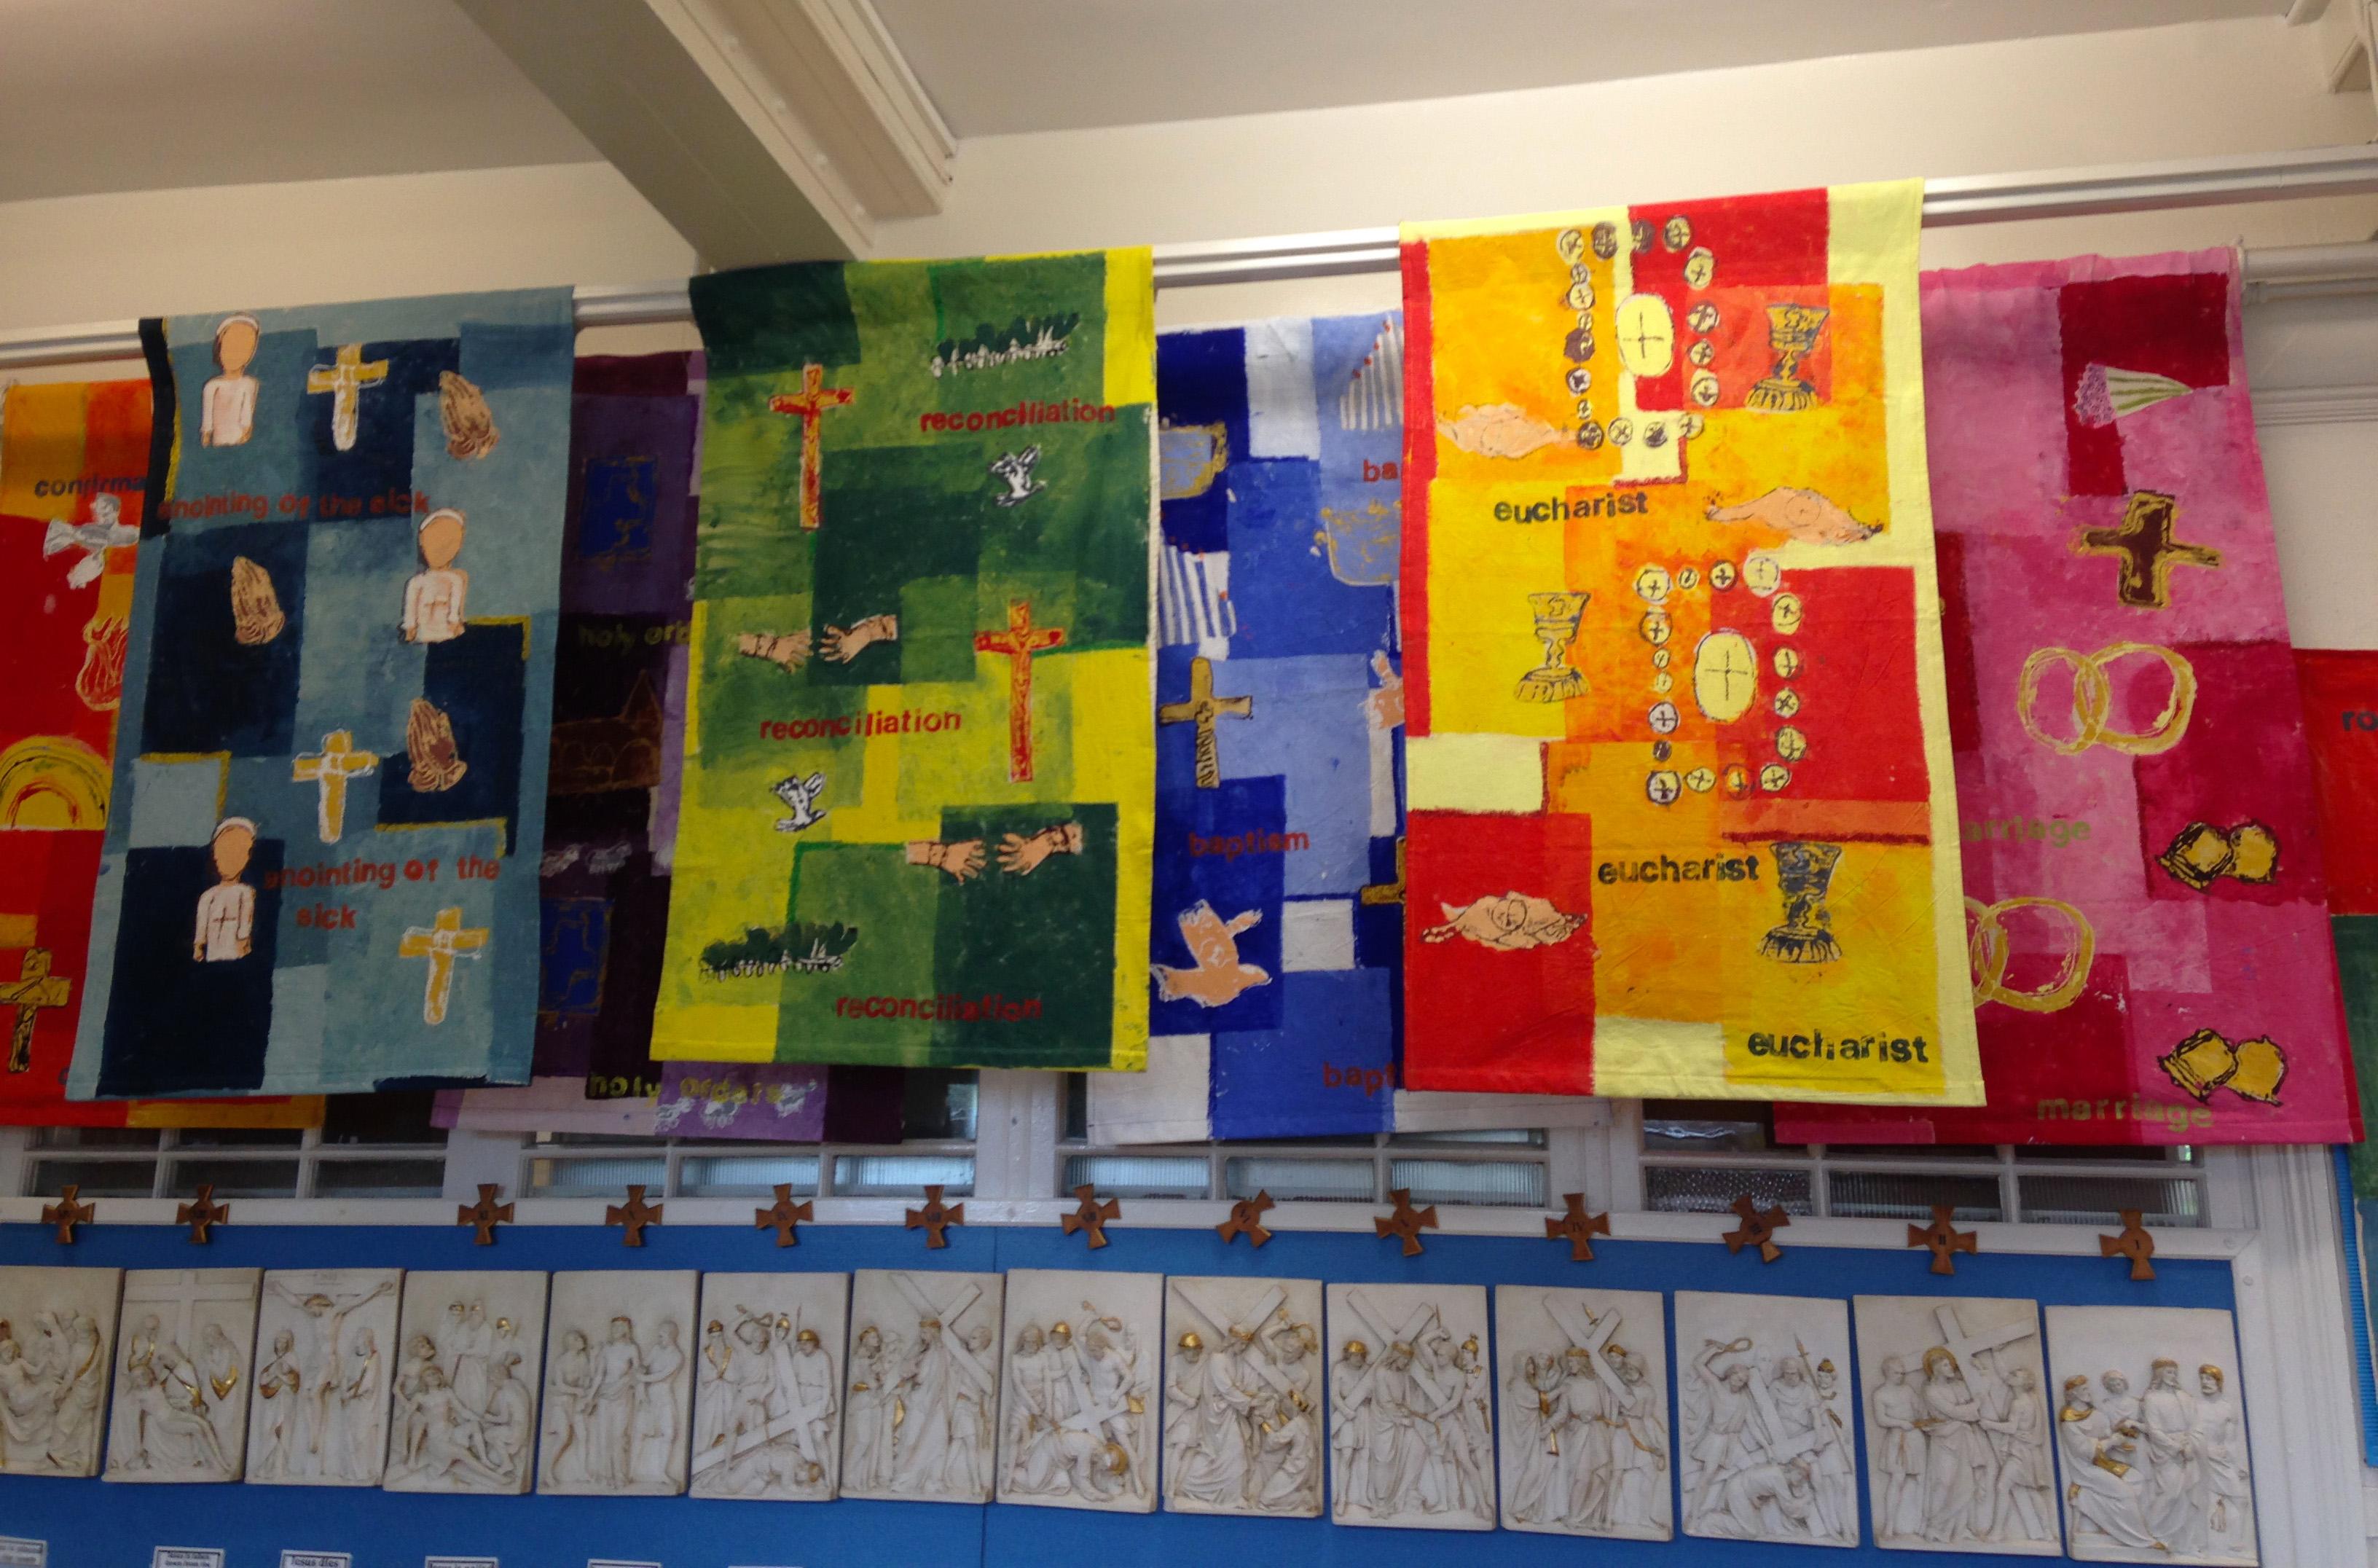 7 Sacrements - Wall Hangings